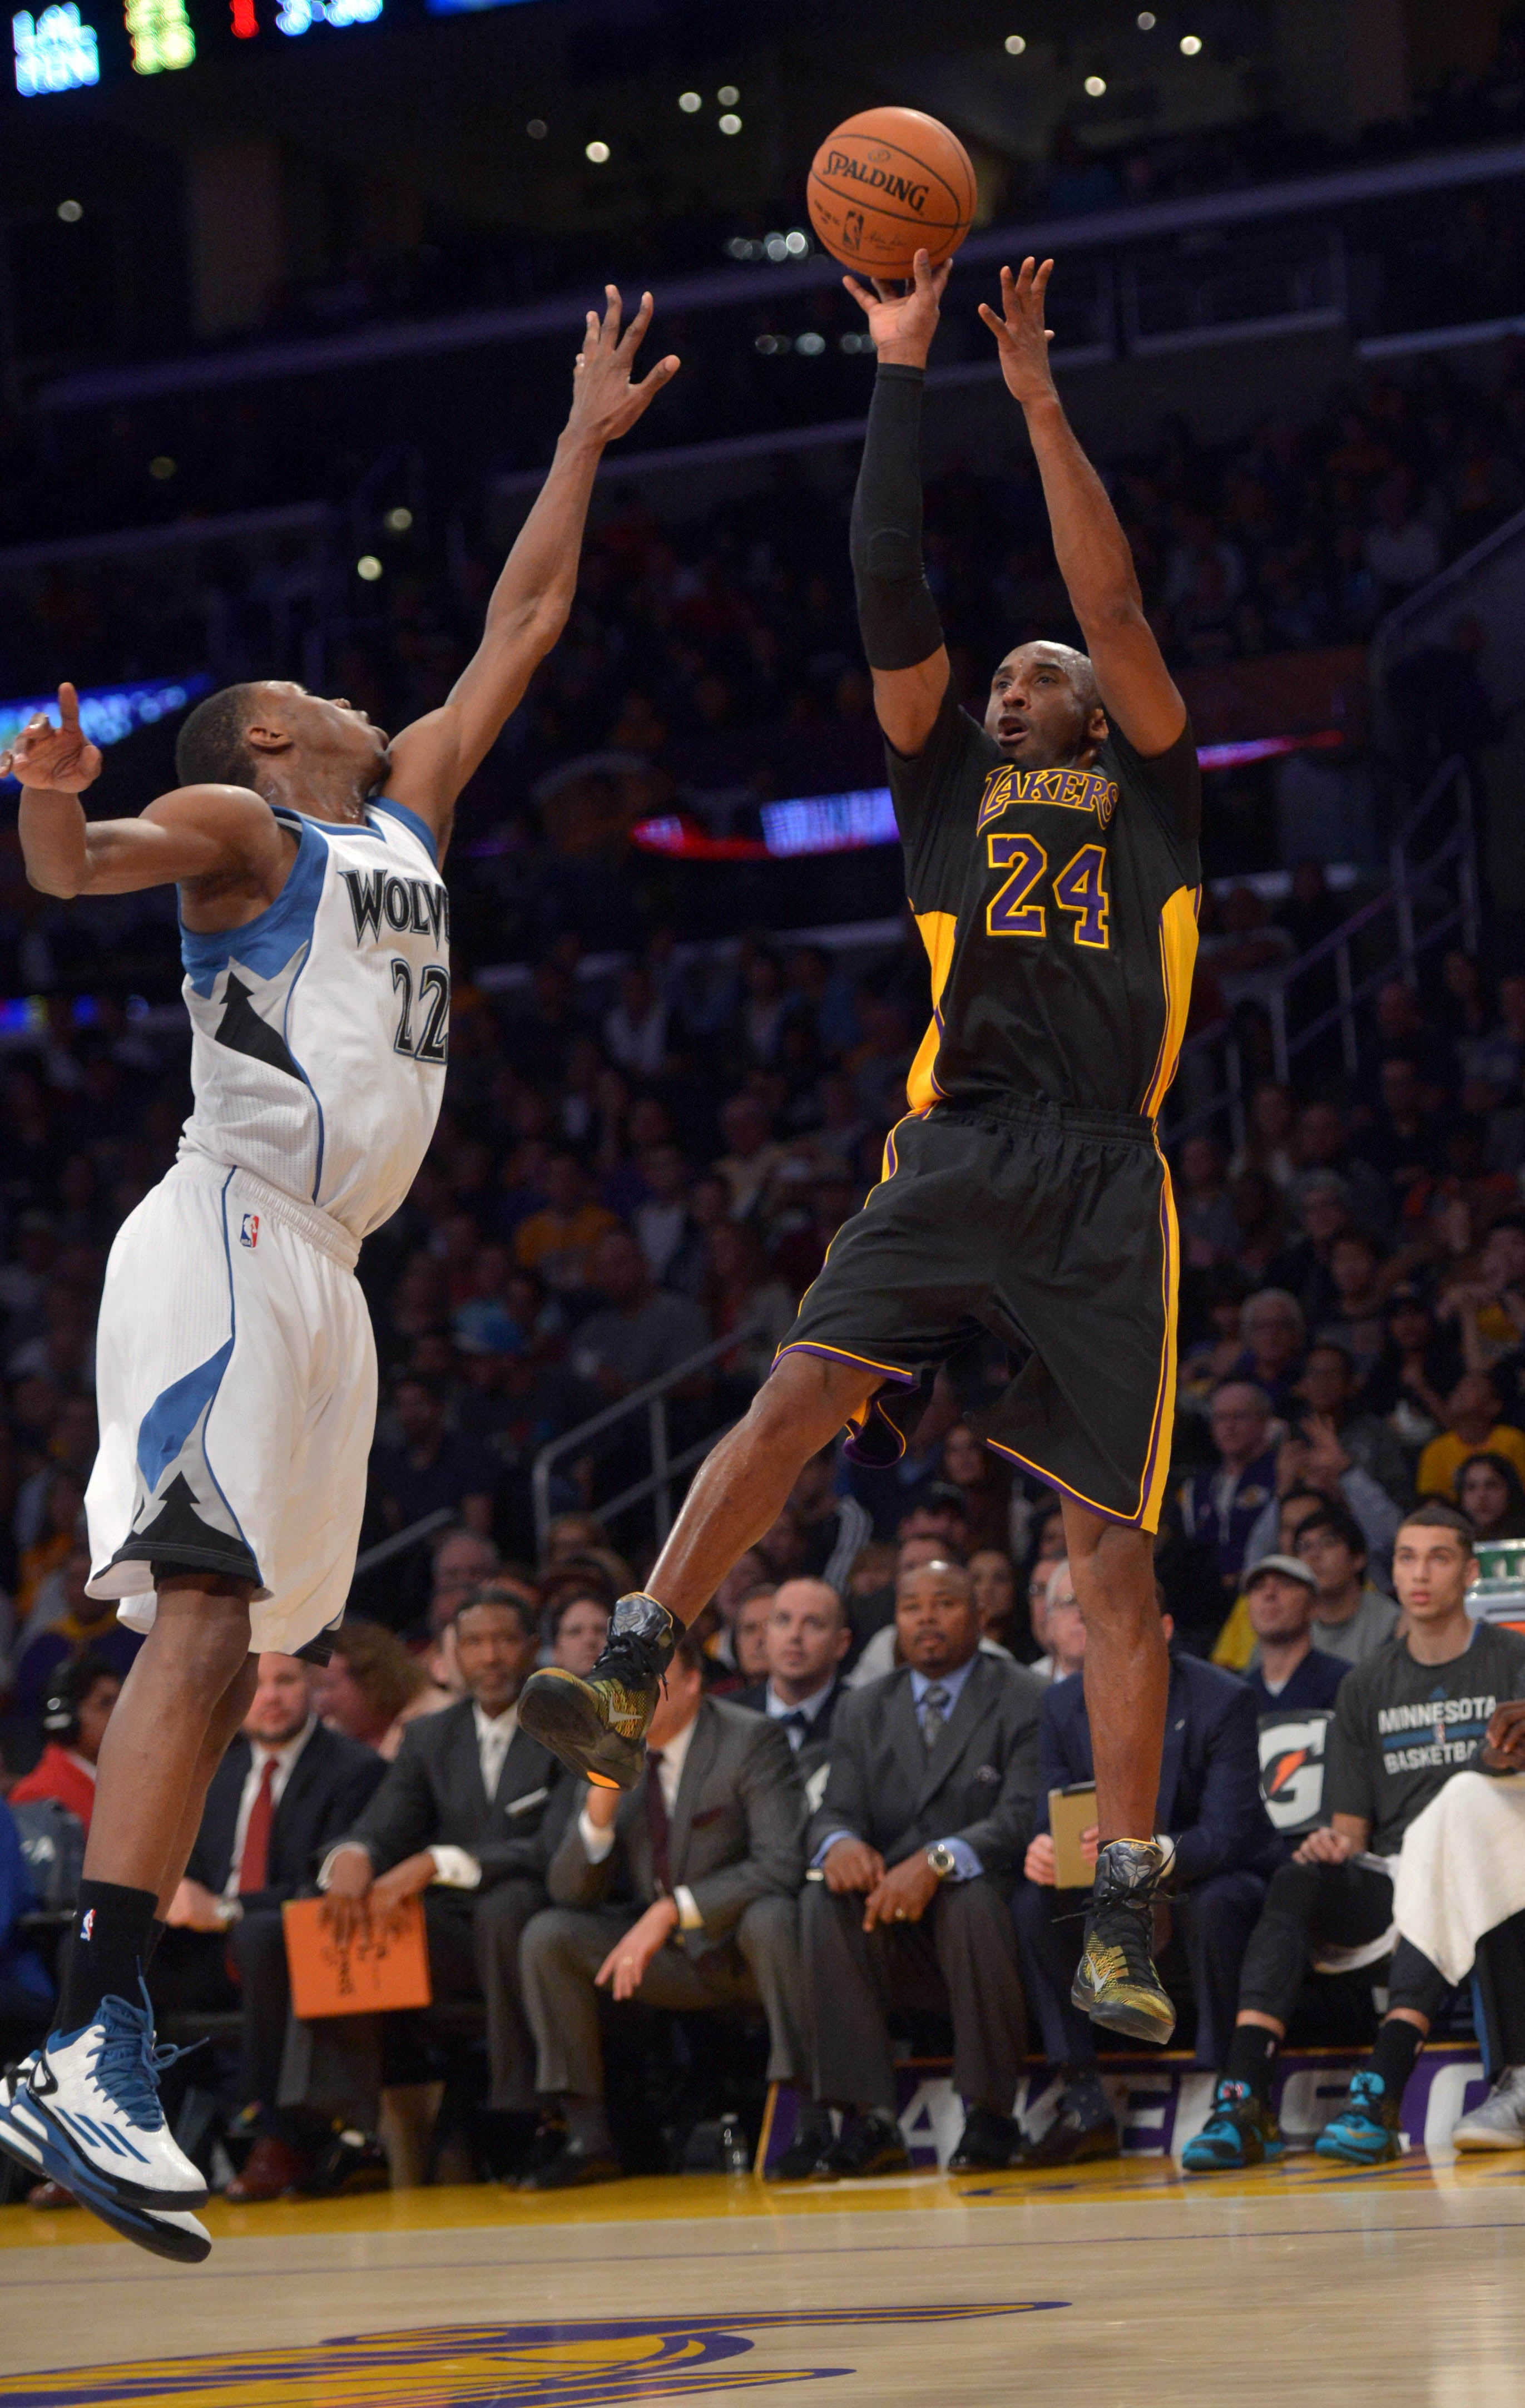 Kobe Bryant misses game-winner, Lakers now worst in West